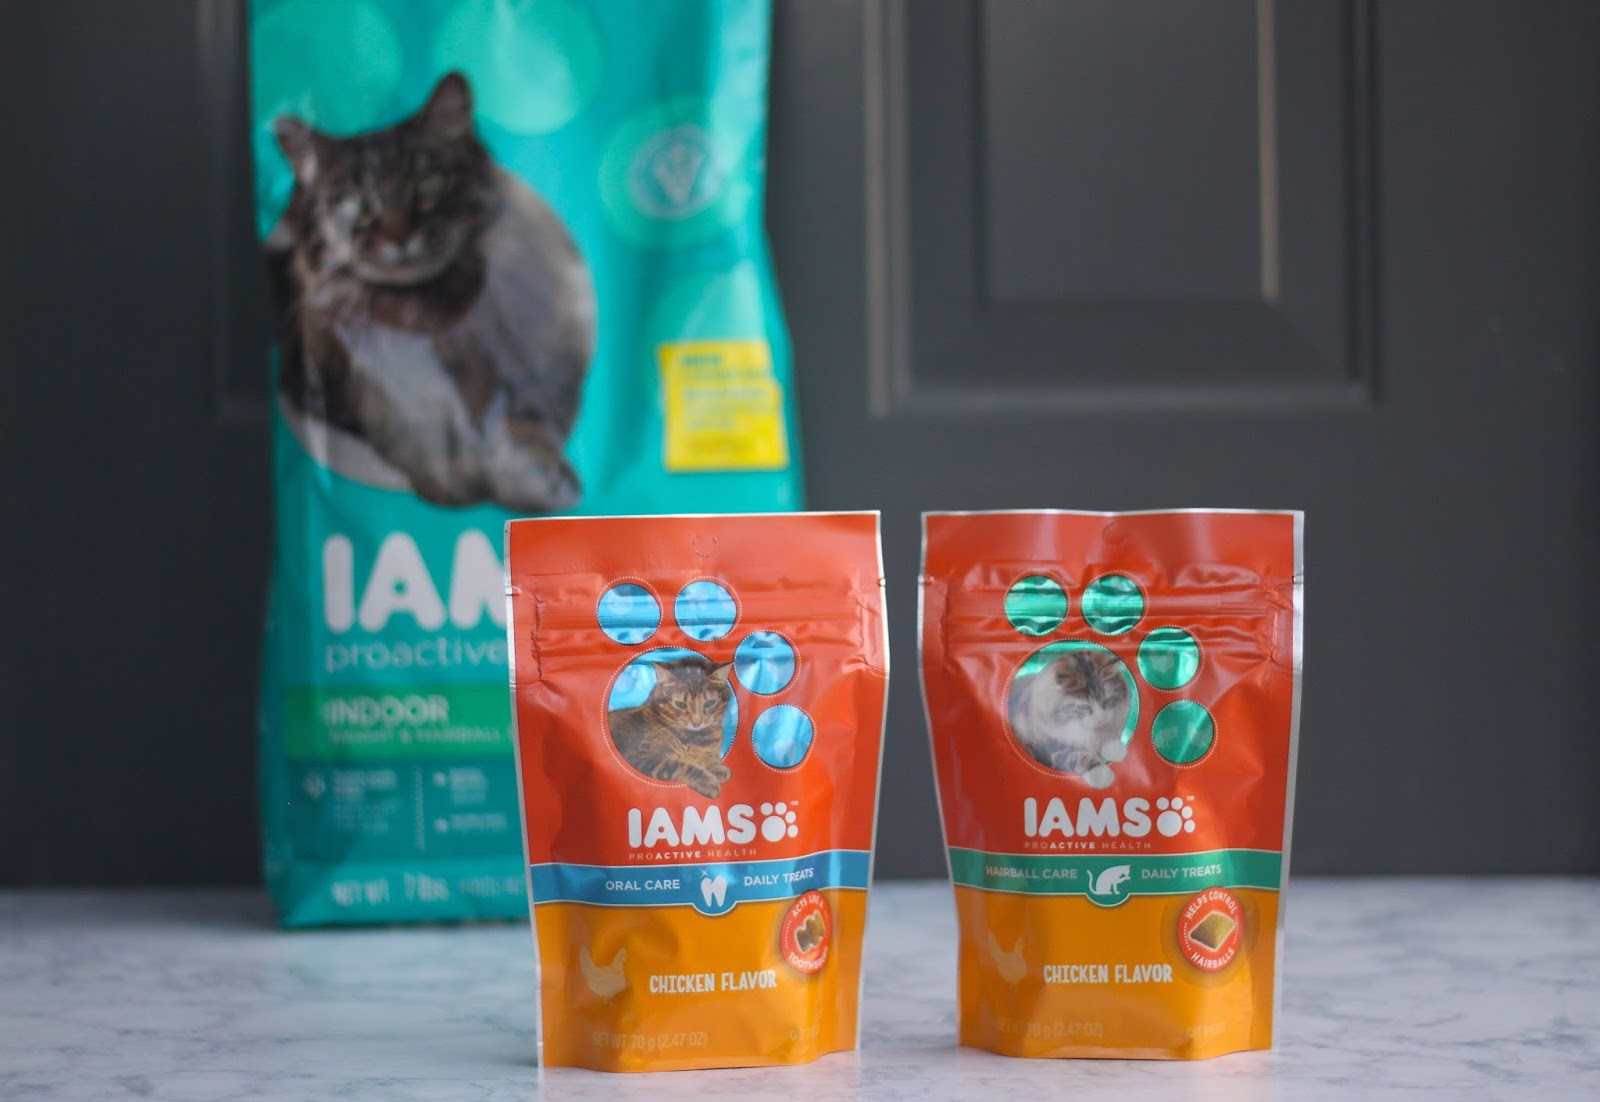 IAMS-proactive-health-cat-food-treats